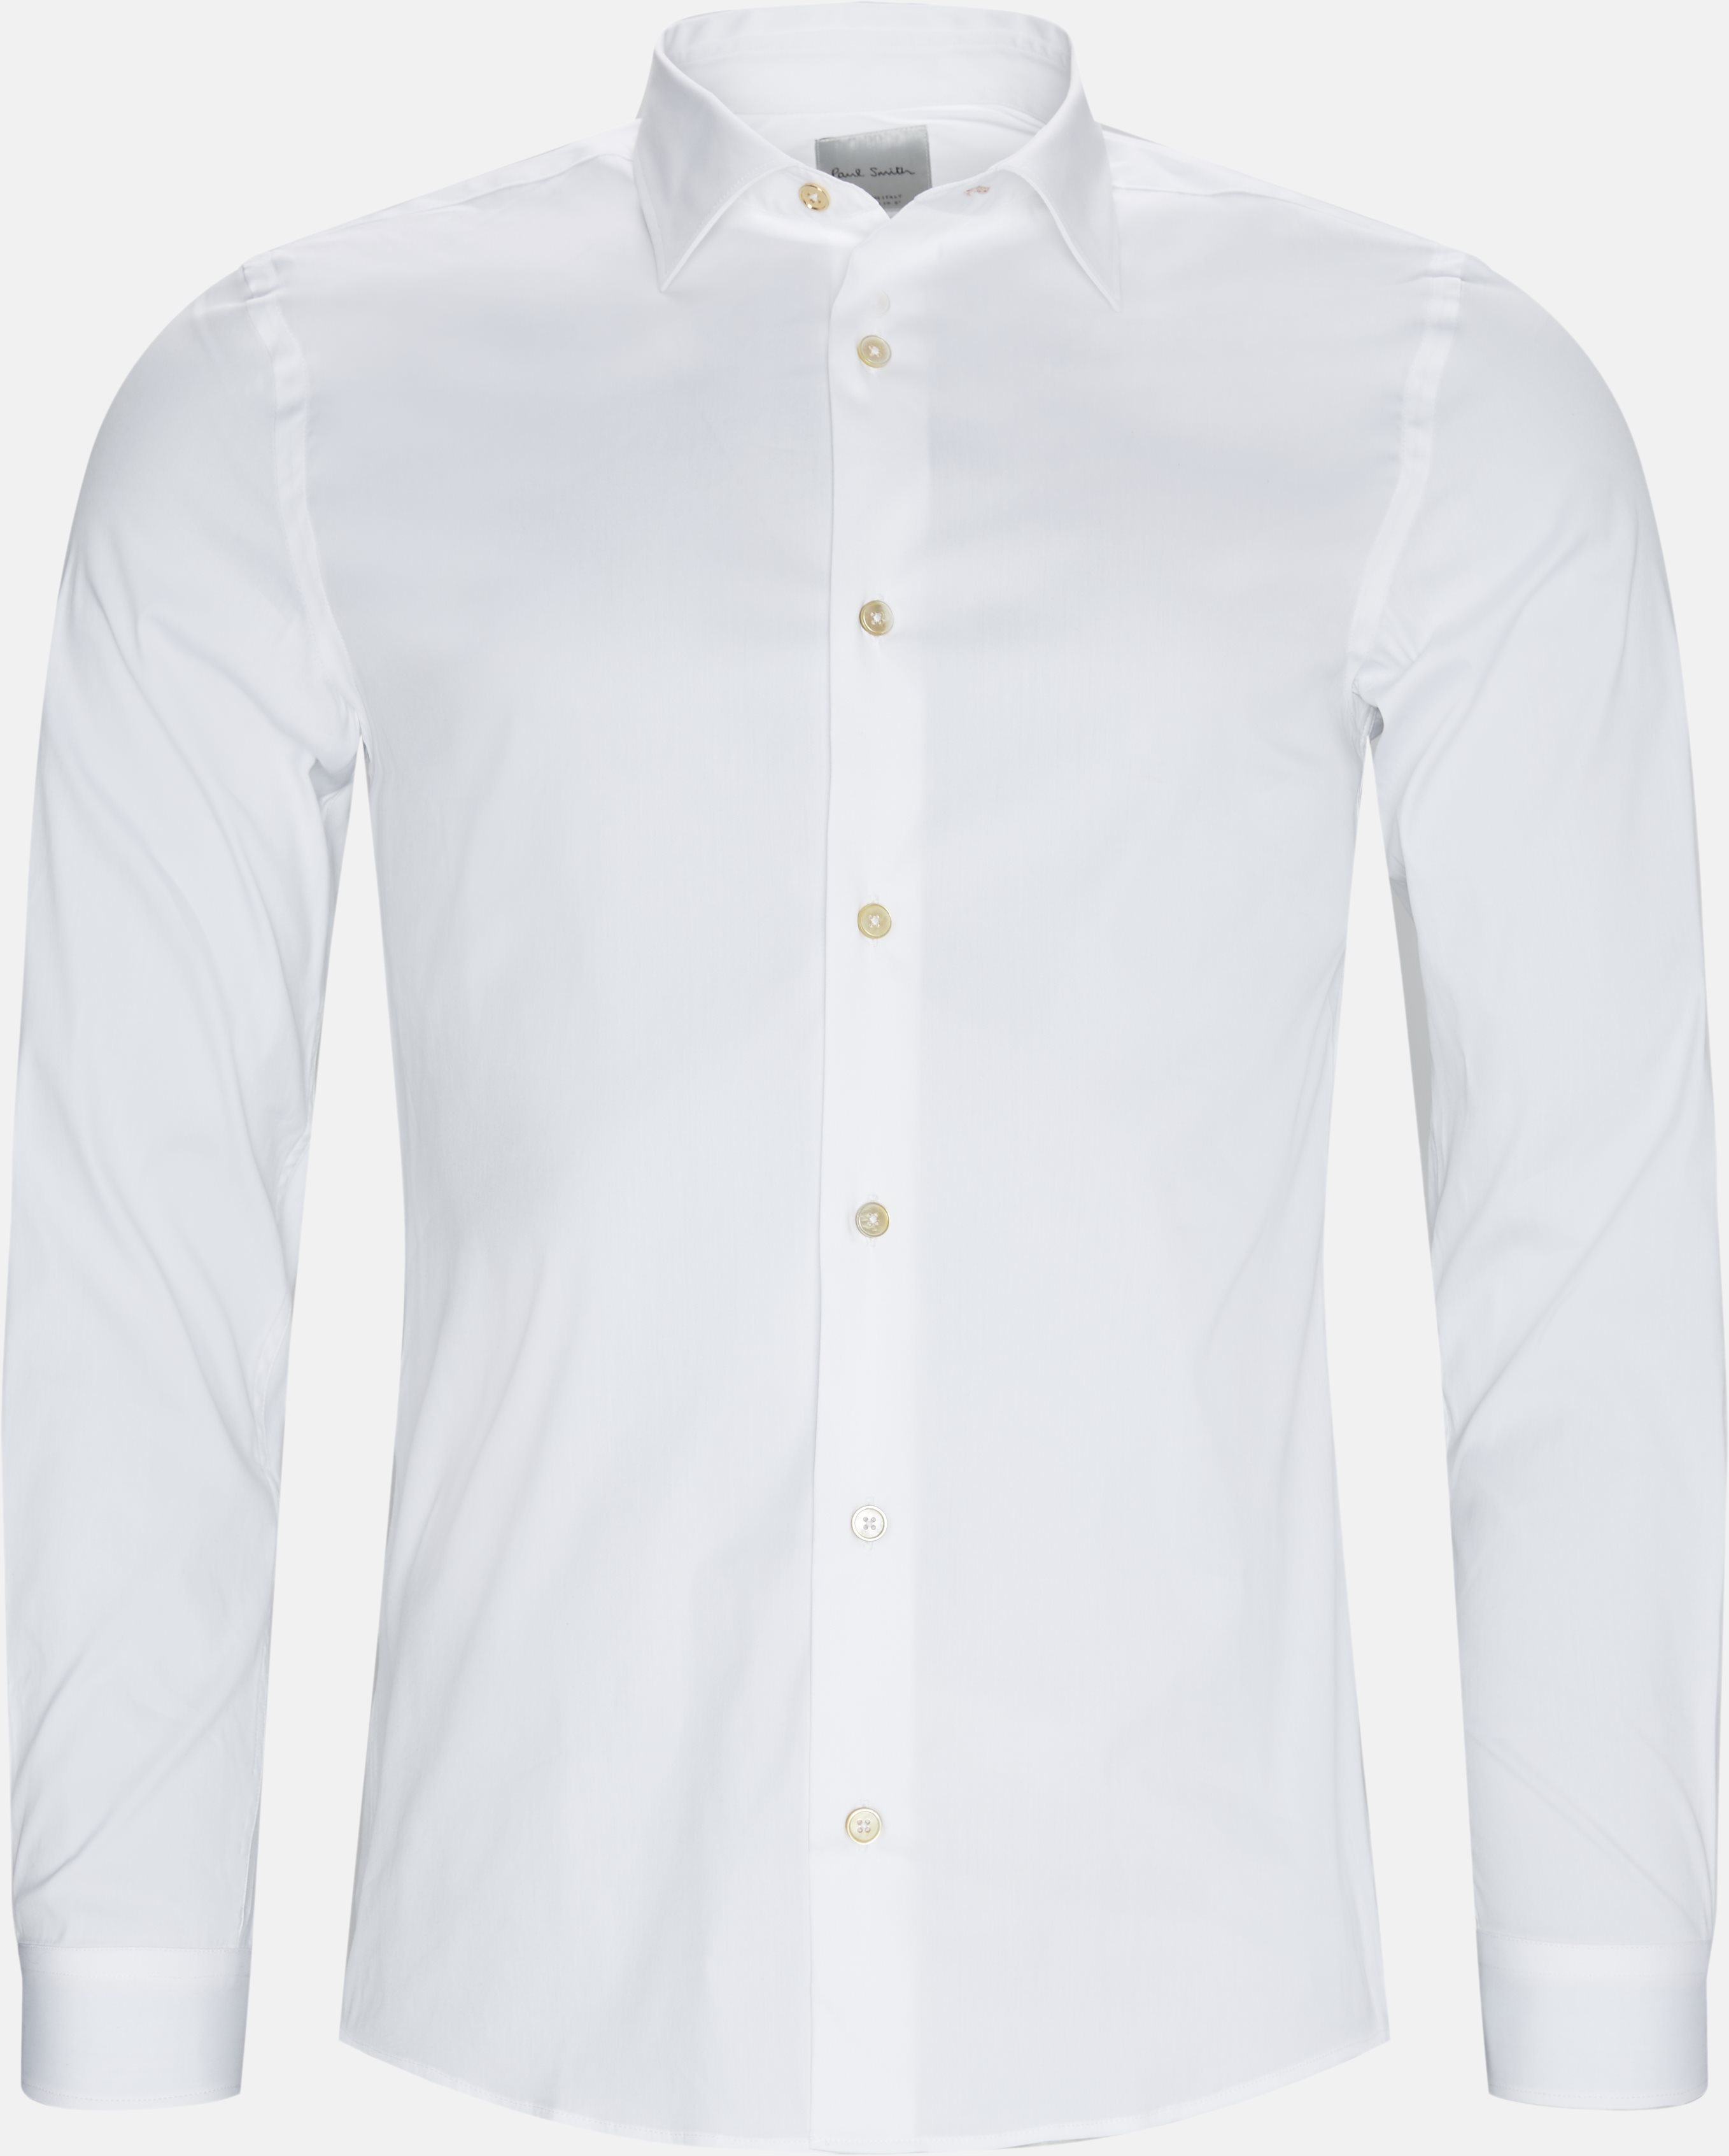 Shirts - Slim - White